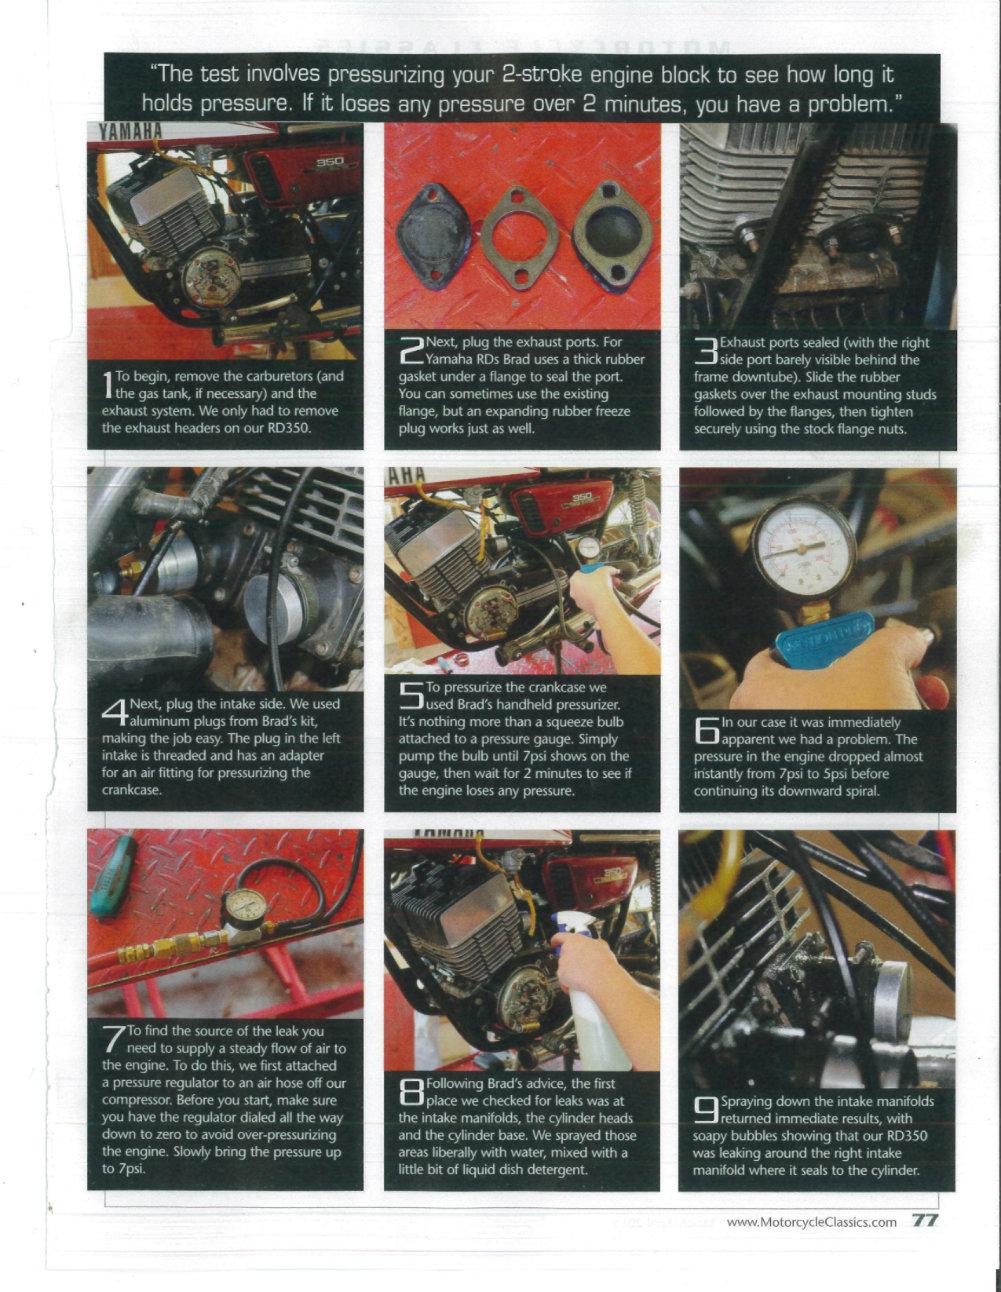 rd350-pressure-check-page-002.jpg